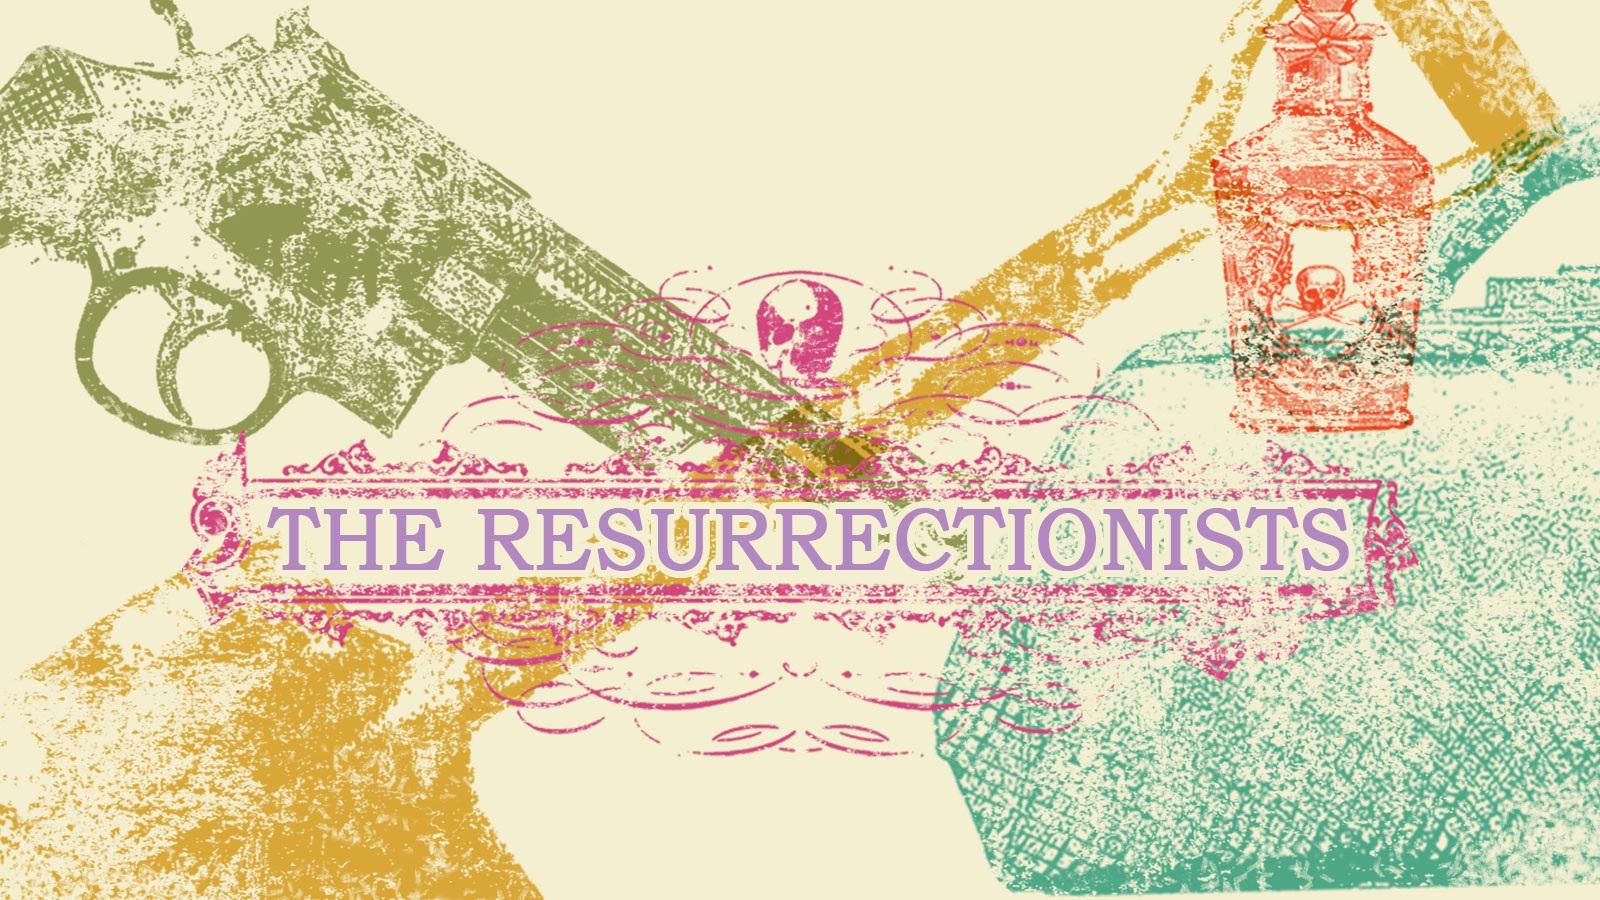 Resurrectionistsbanner.jpg